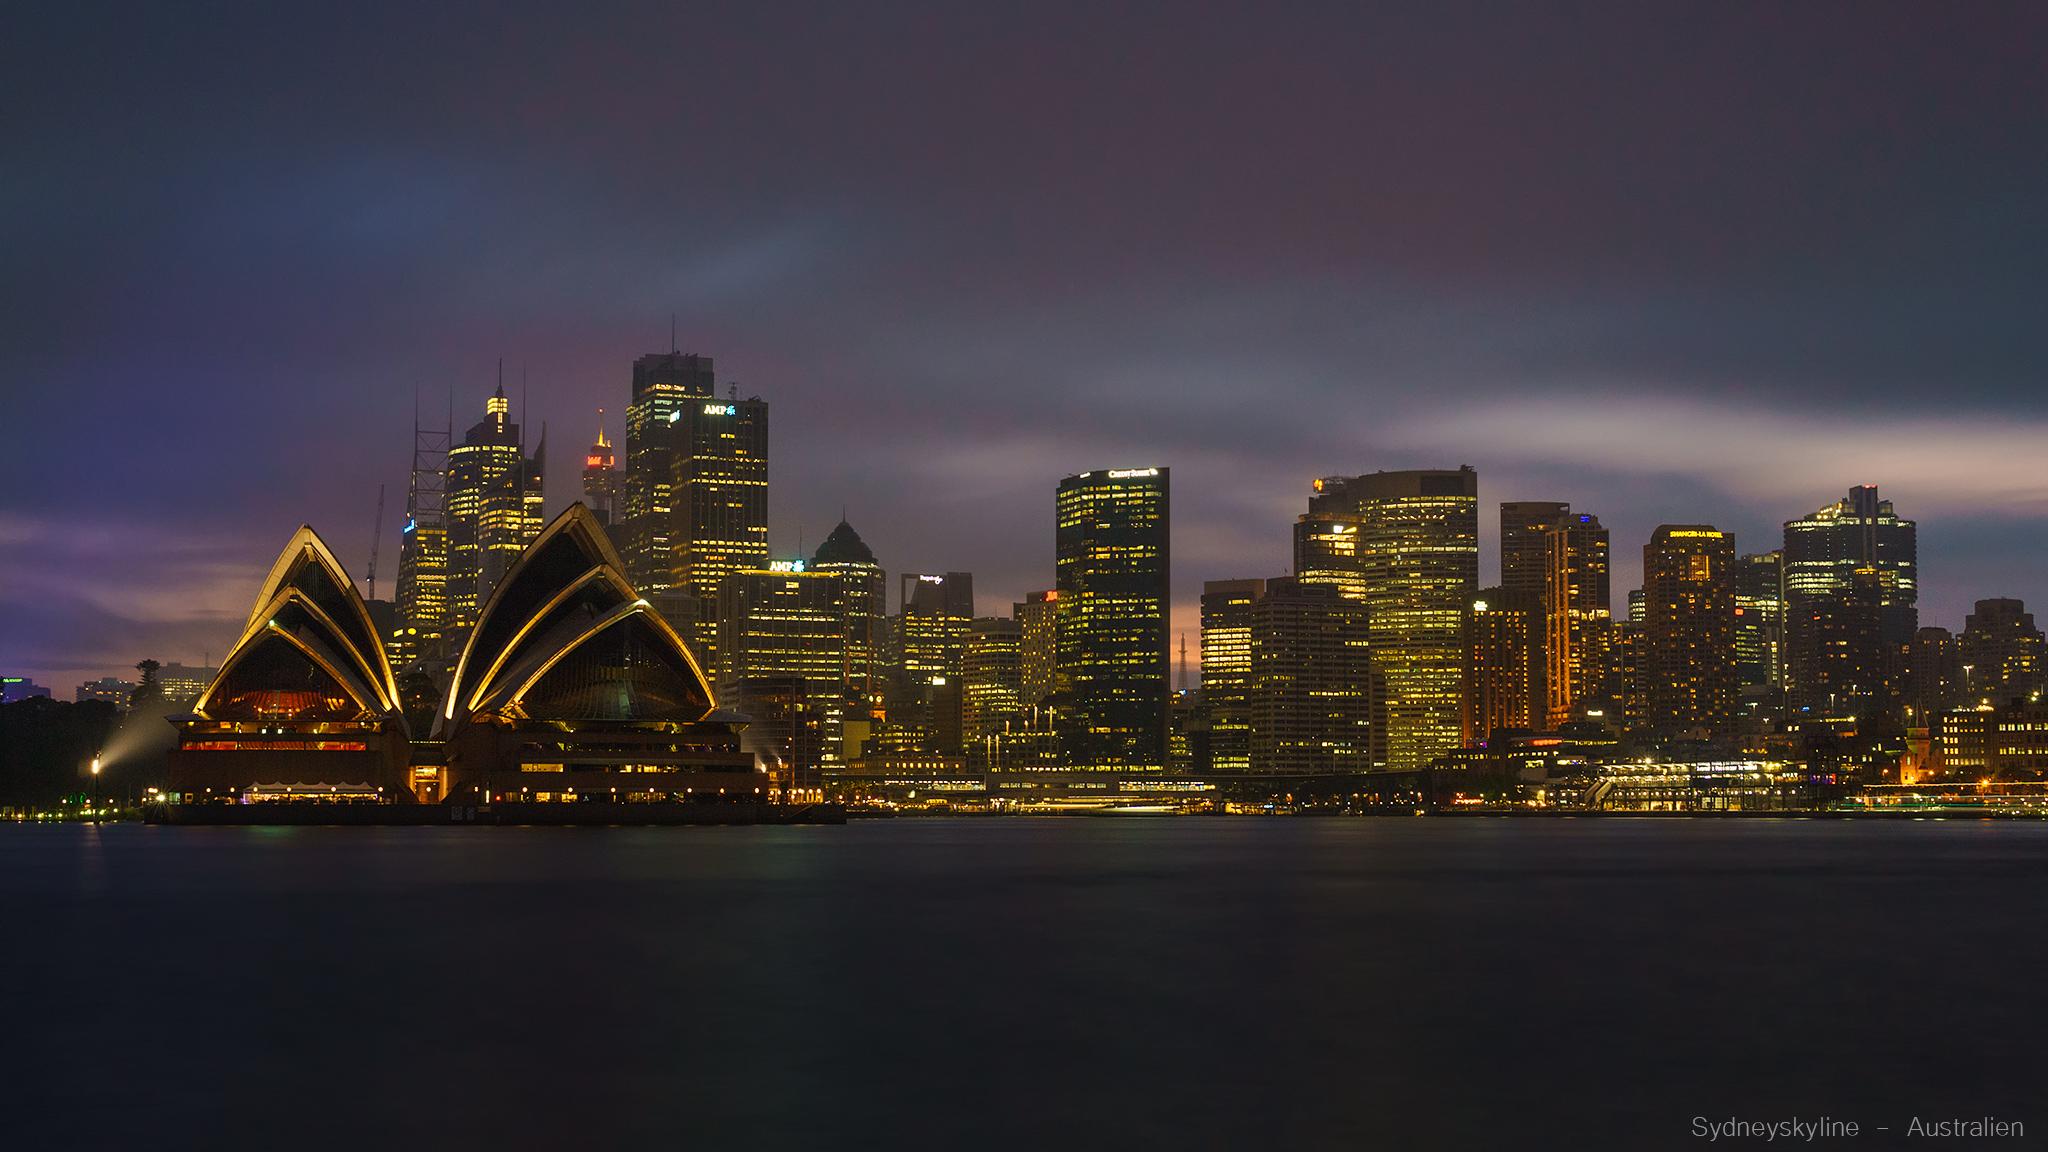 Sydneyskyline from Kirribilli, Australia